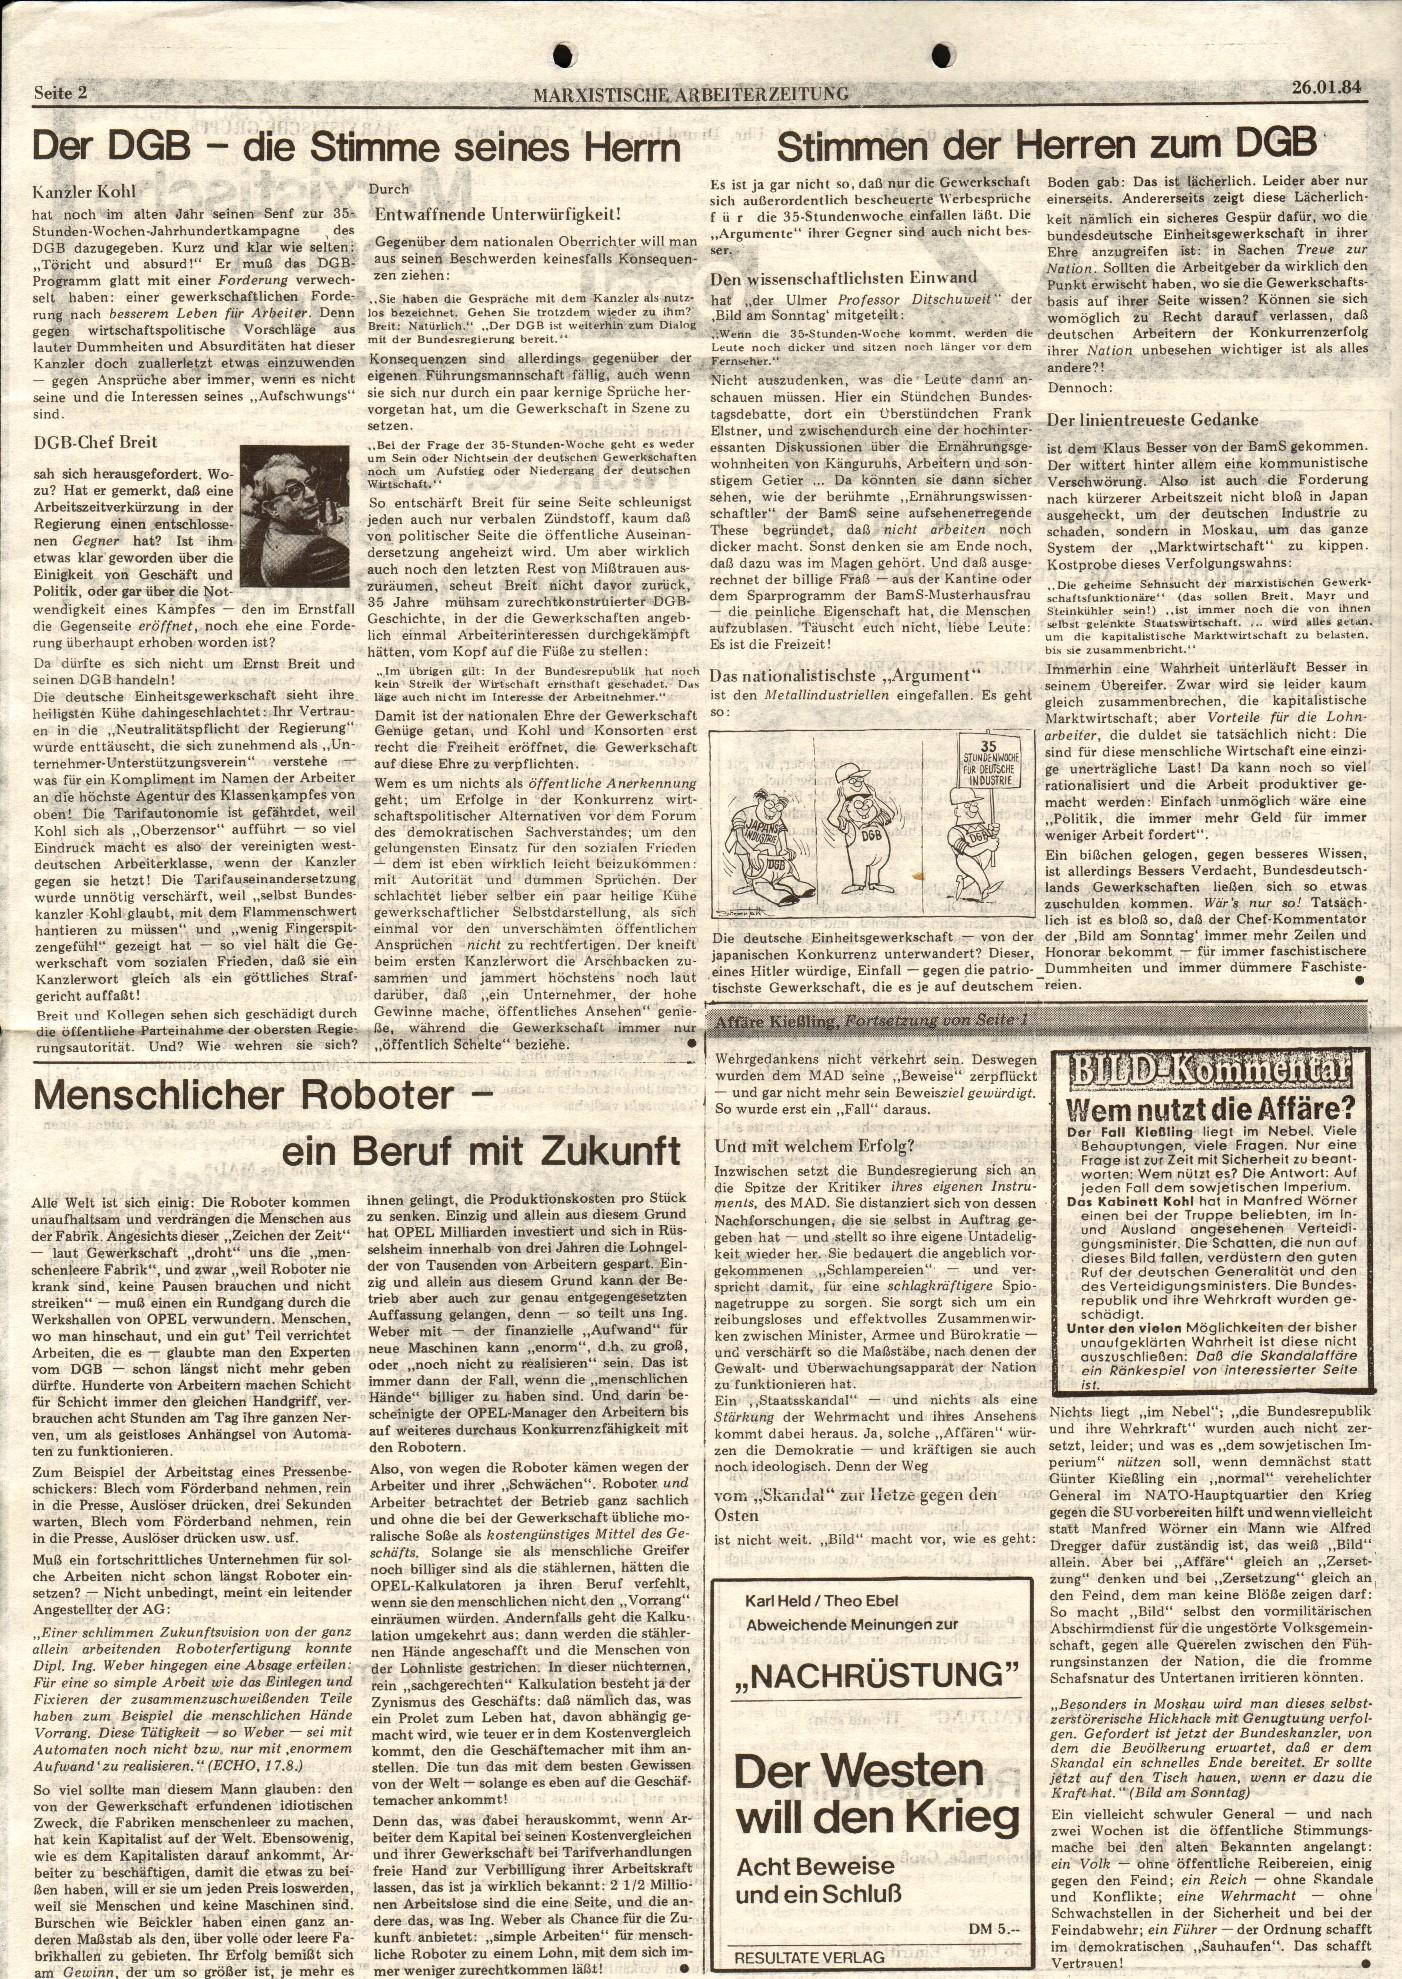 Ruesselsheim_MG_Marxistische_Arbeiterzeitung_Opel_19840126_02